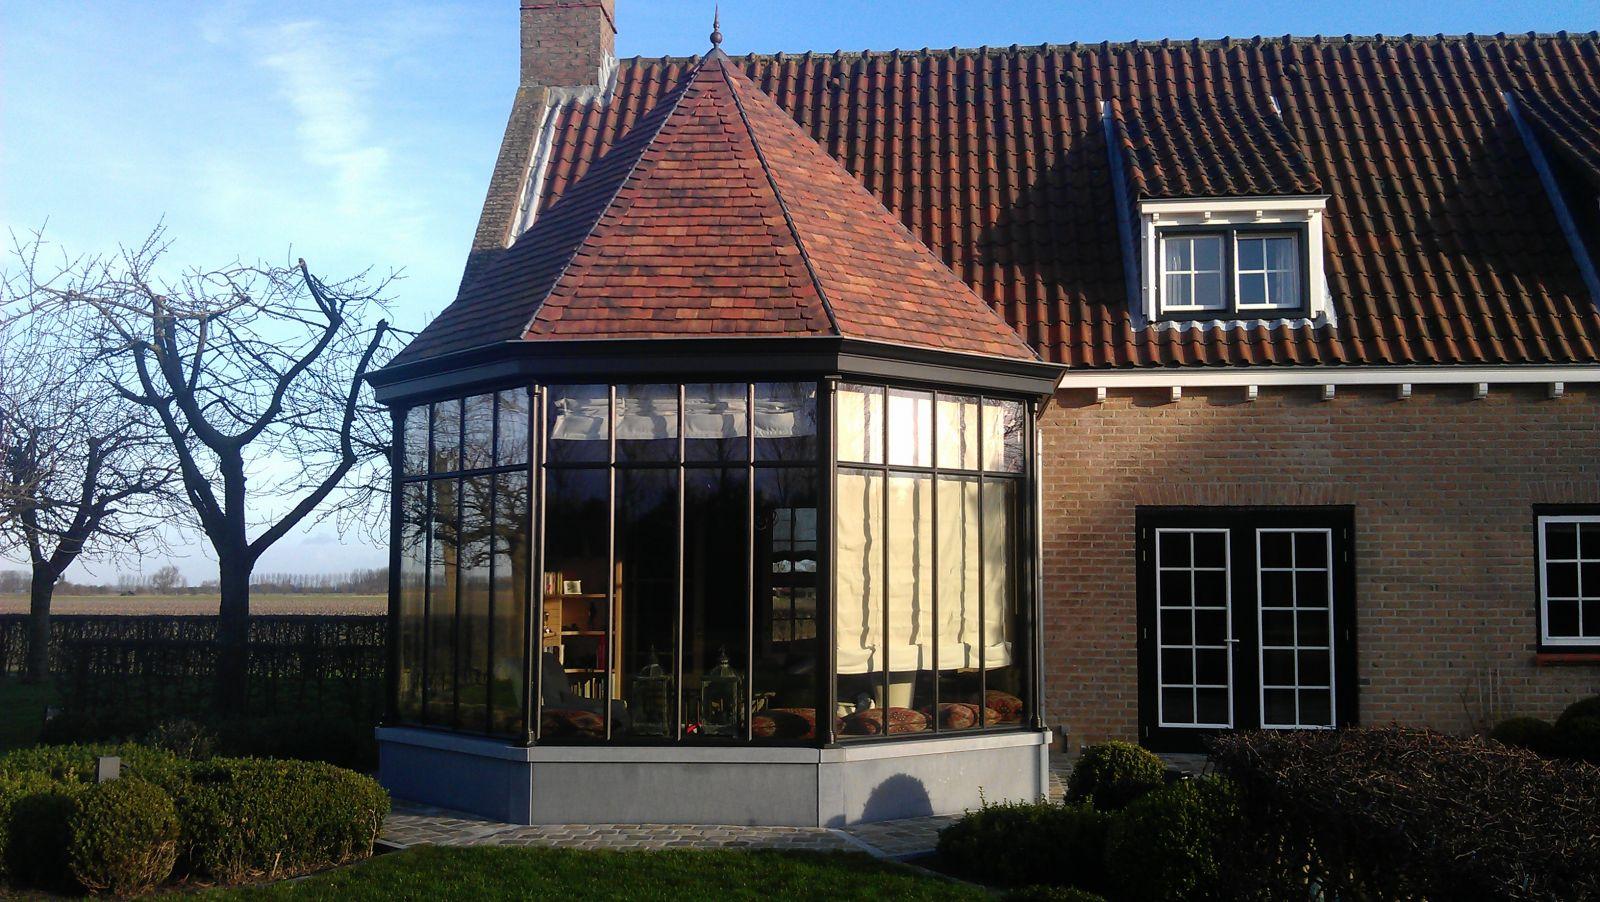 https://www.siersmederijpladdet.nl/wp-content/uploads/2020/11/erker-woonhuis-1.jpg